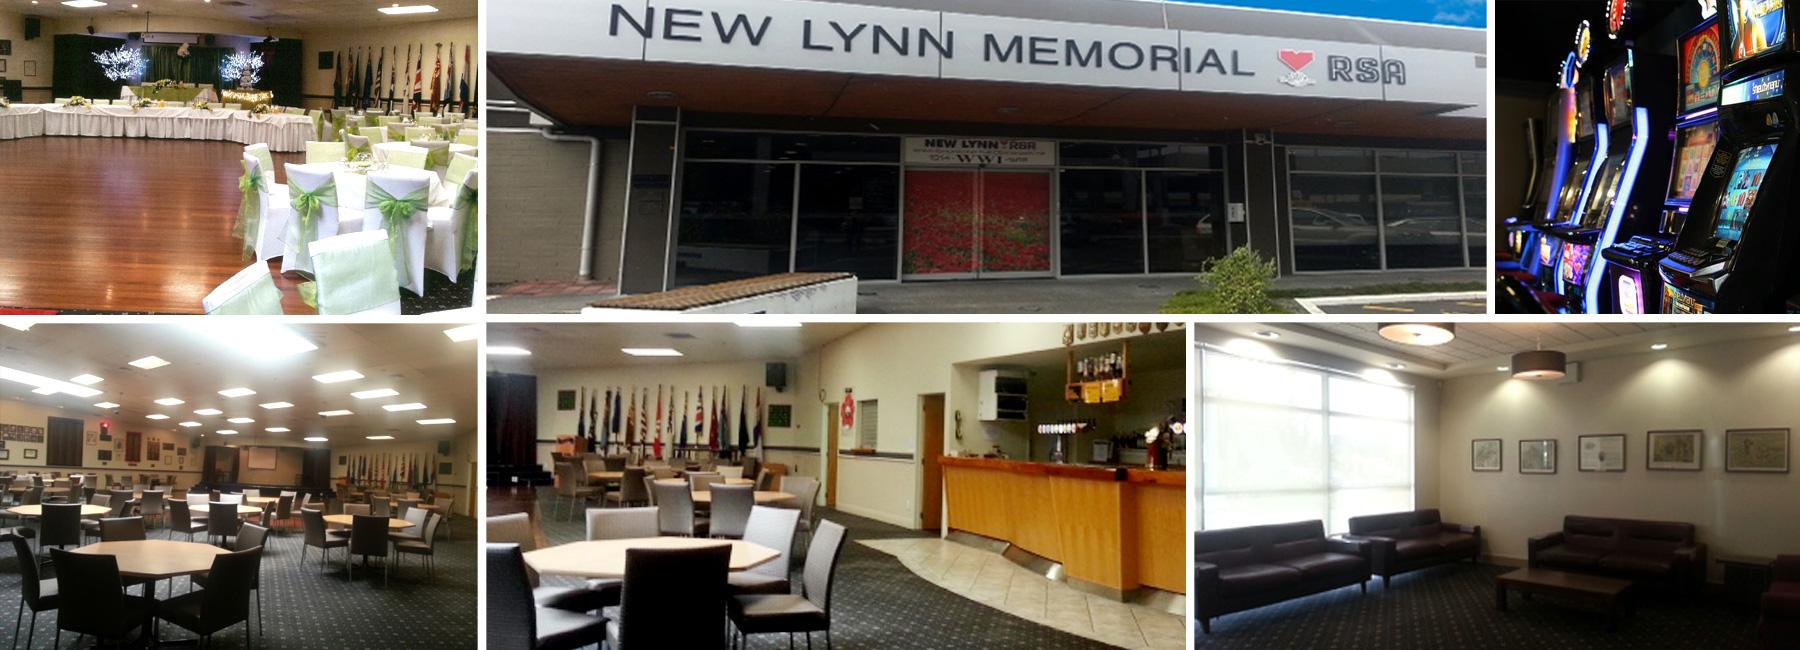 New Lynn Rsa Restaurant